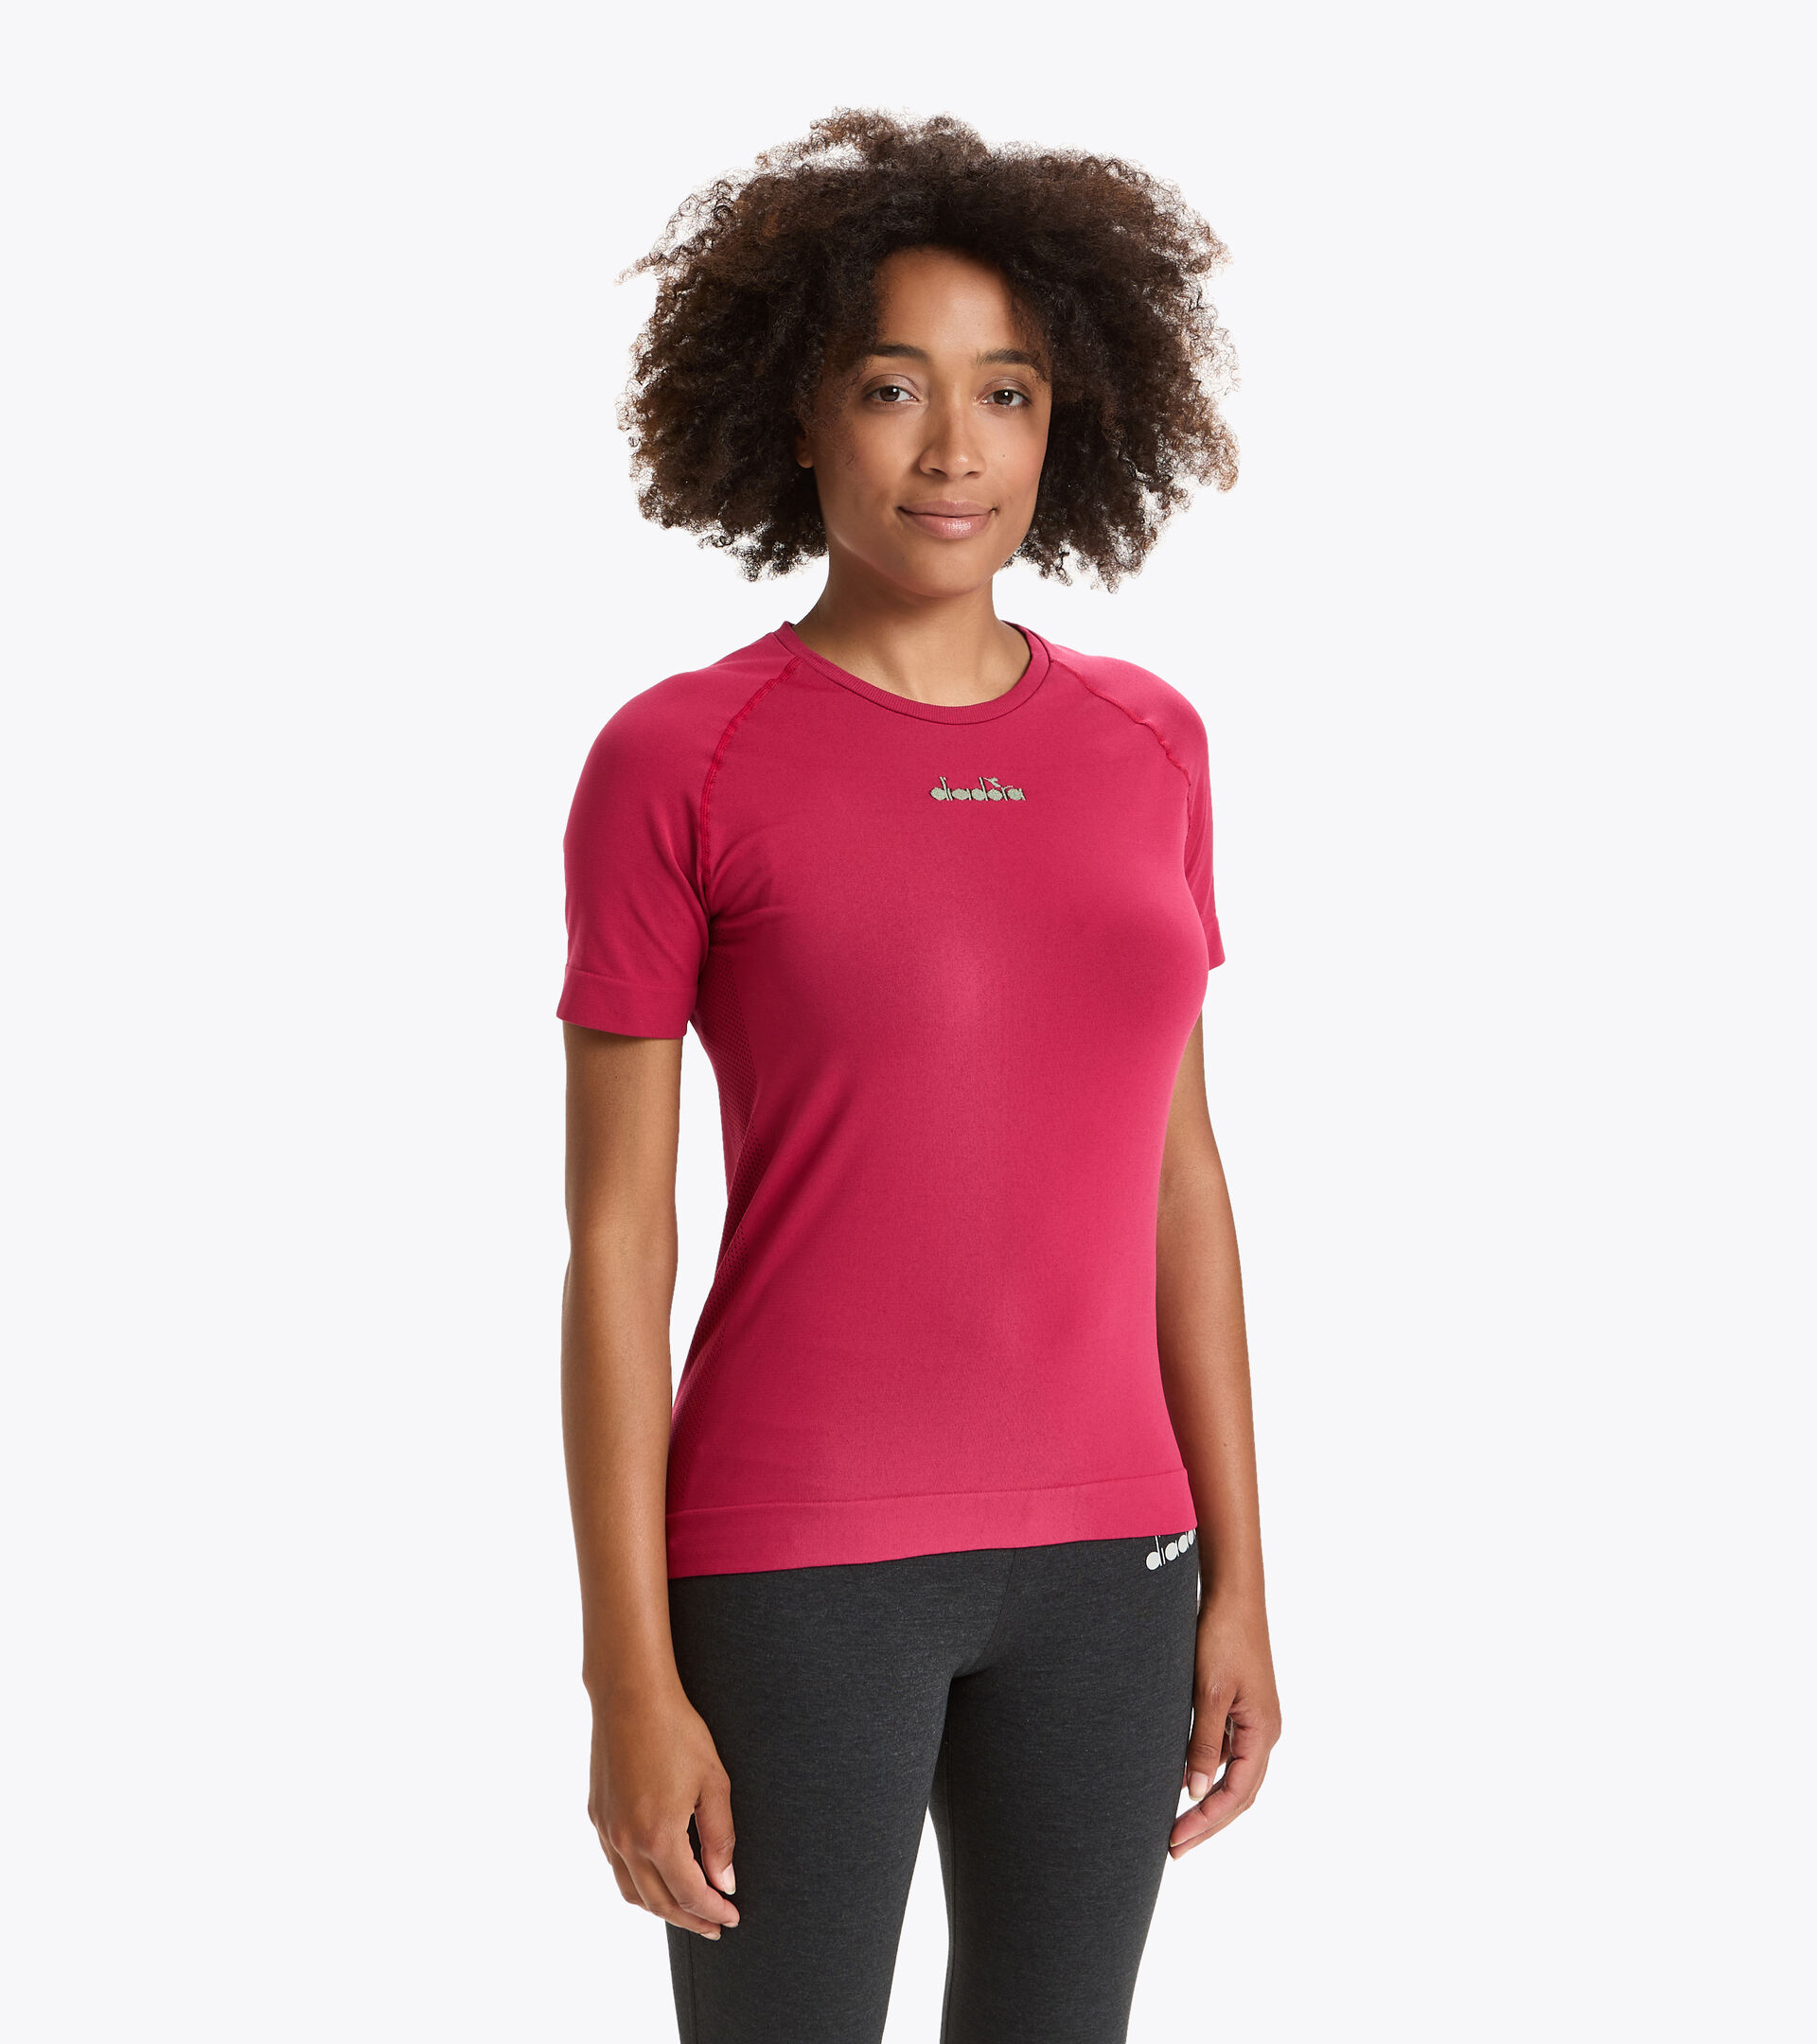 Running-T-Shirt Made in Italy - Damen L. SS SKIN FRIENDLY T-SHIRT KNALLIG ROSA - Diadora